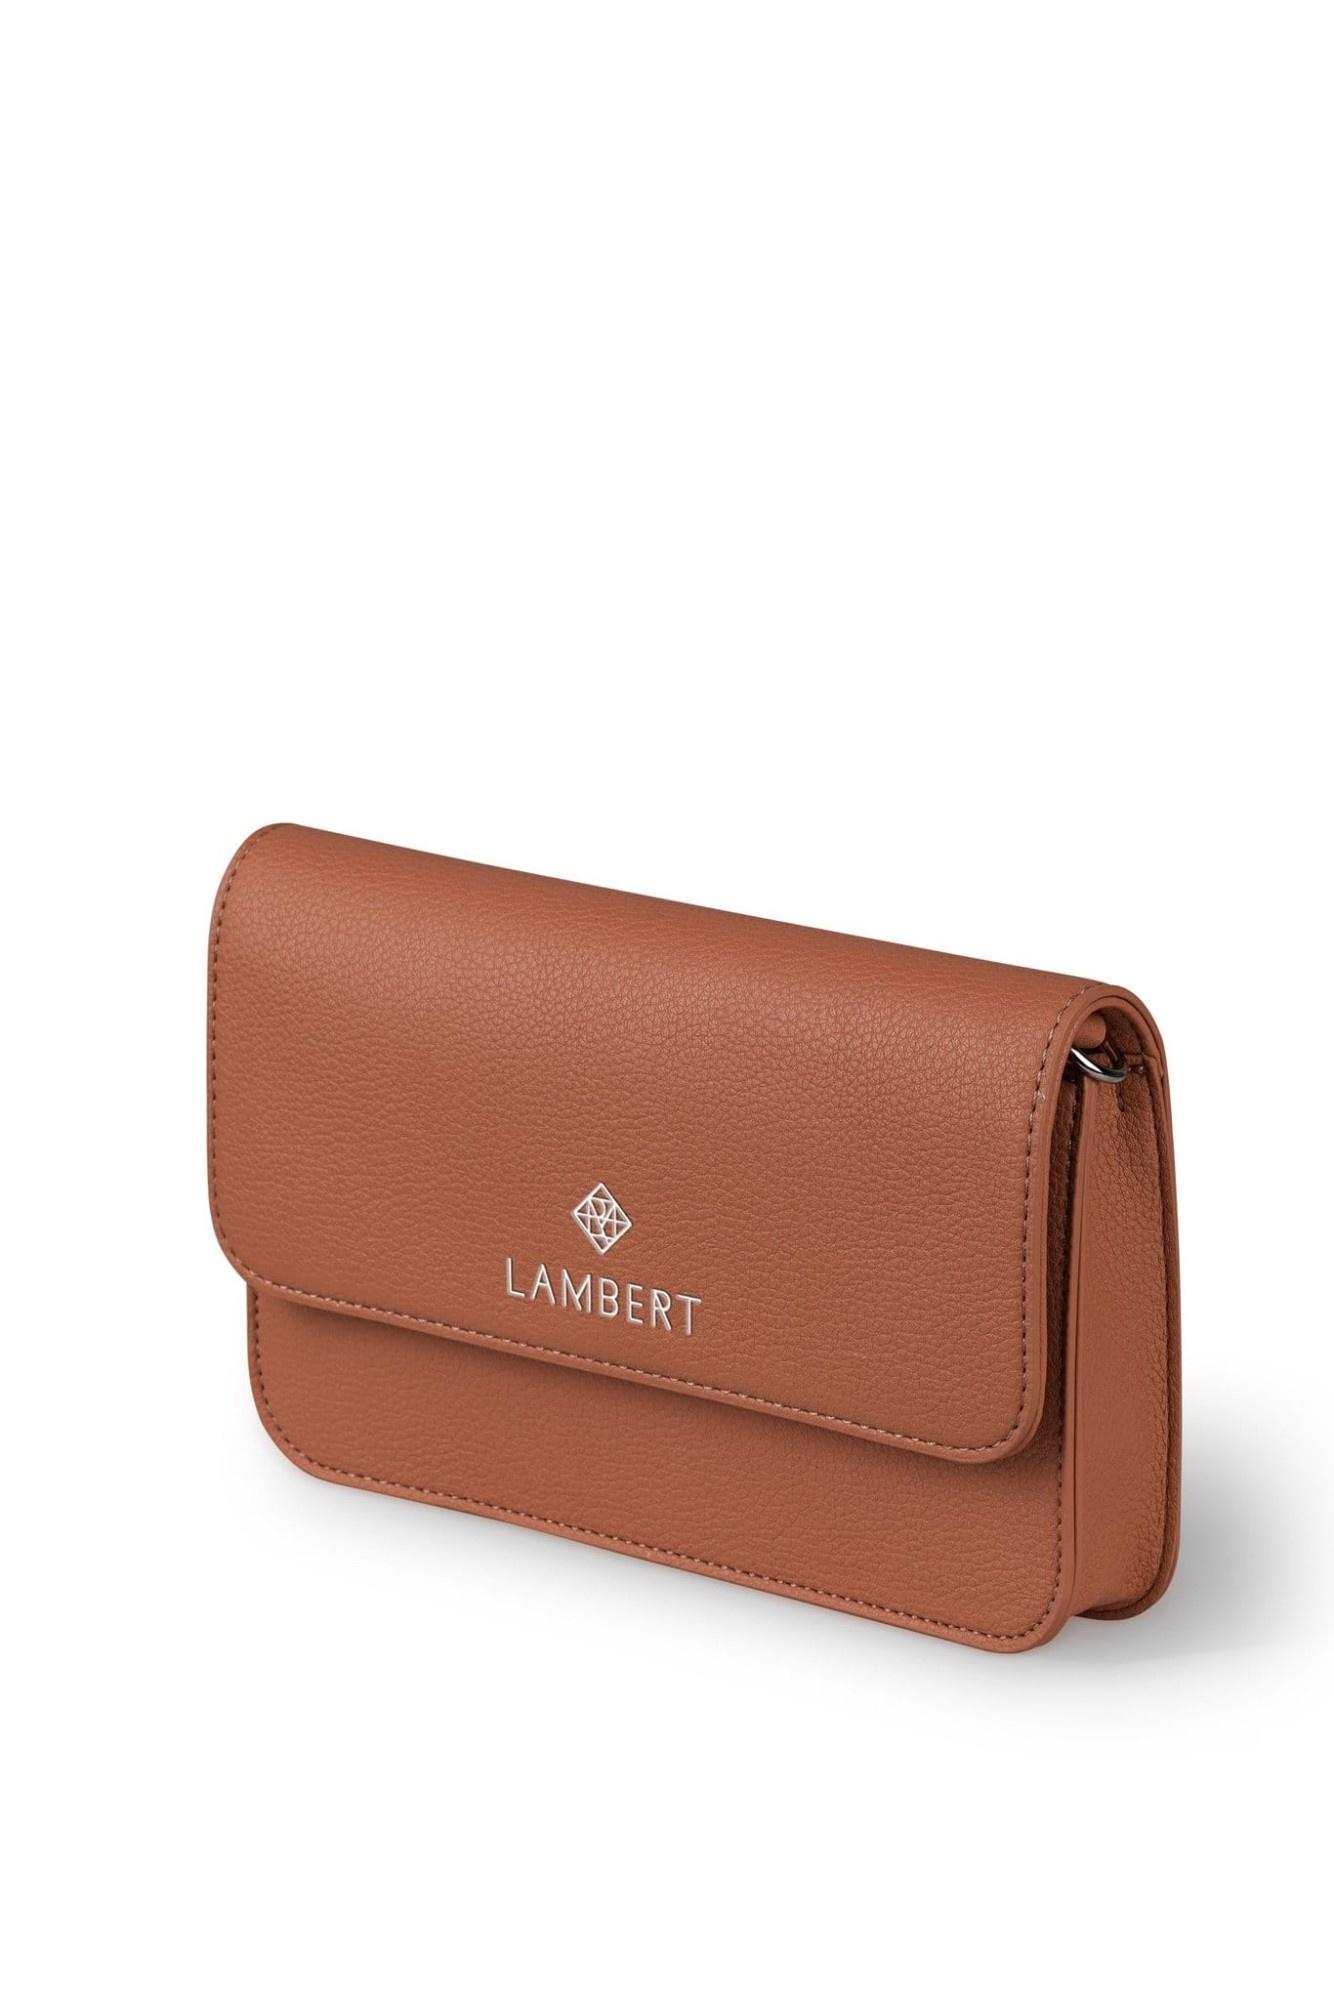 Lambert GABRIELLE - Sac 4-en-1 en cuir vegan tan pour femme